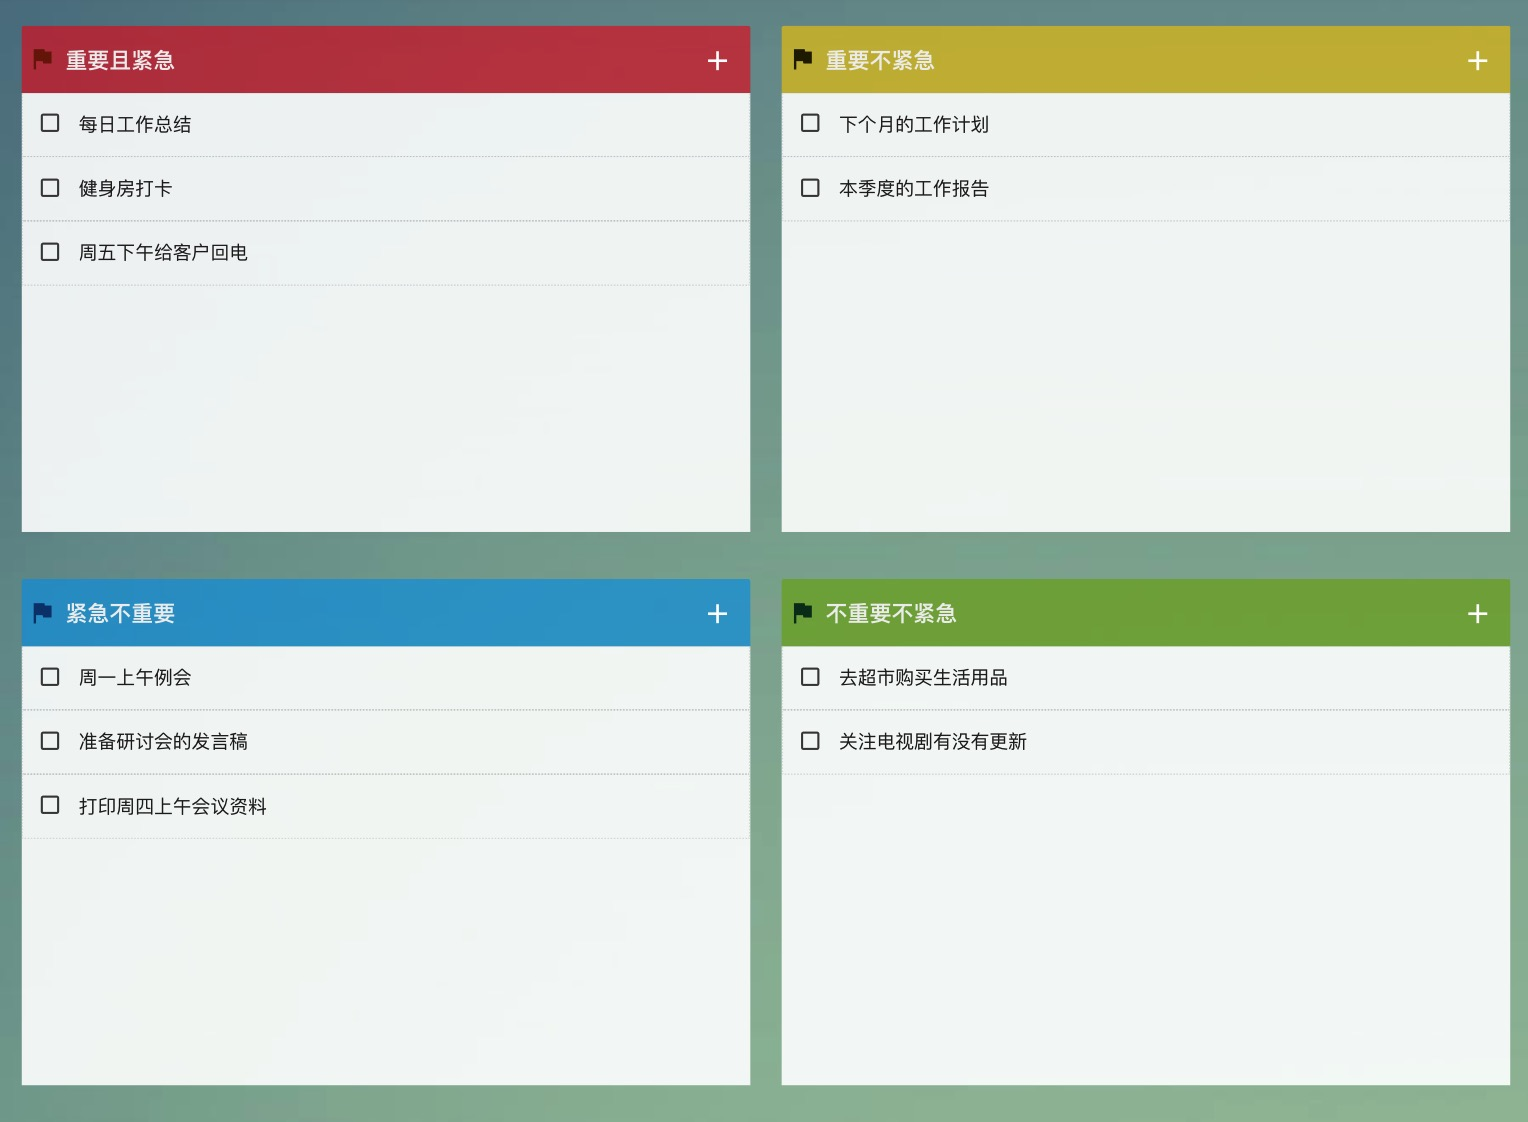 KooTeam新版本发布,增加 Mysql 数据库支持KooTeam新版本发布,增加 Mysql 数据库支持